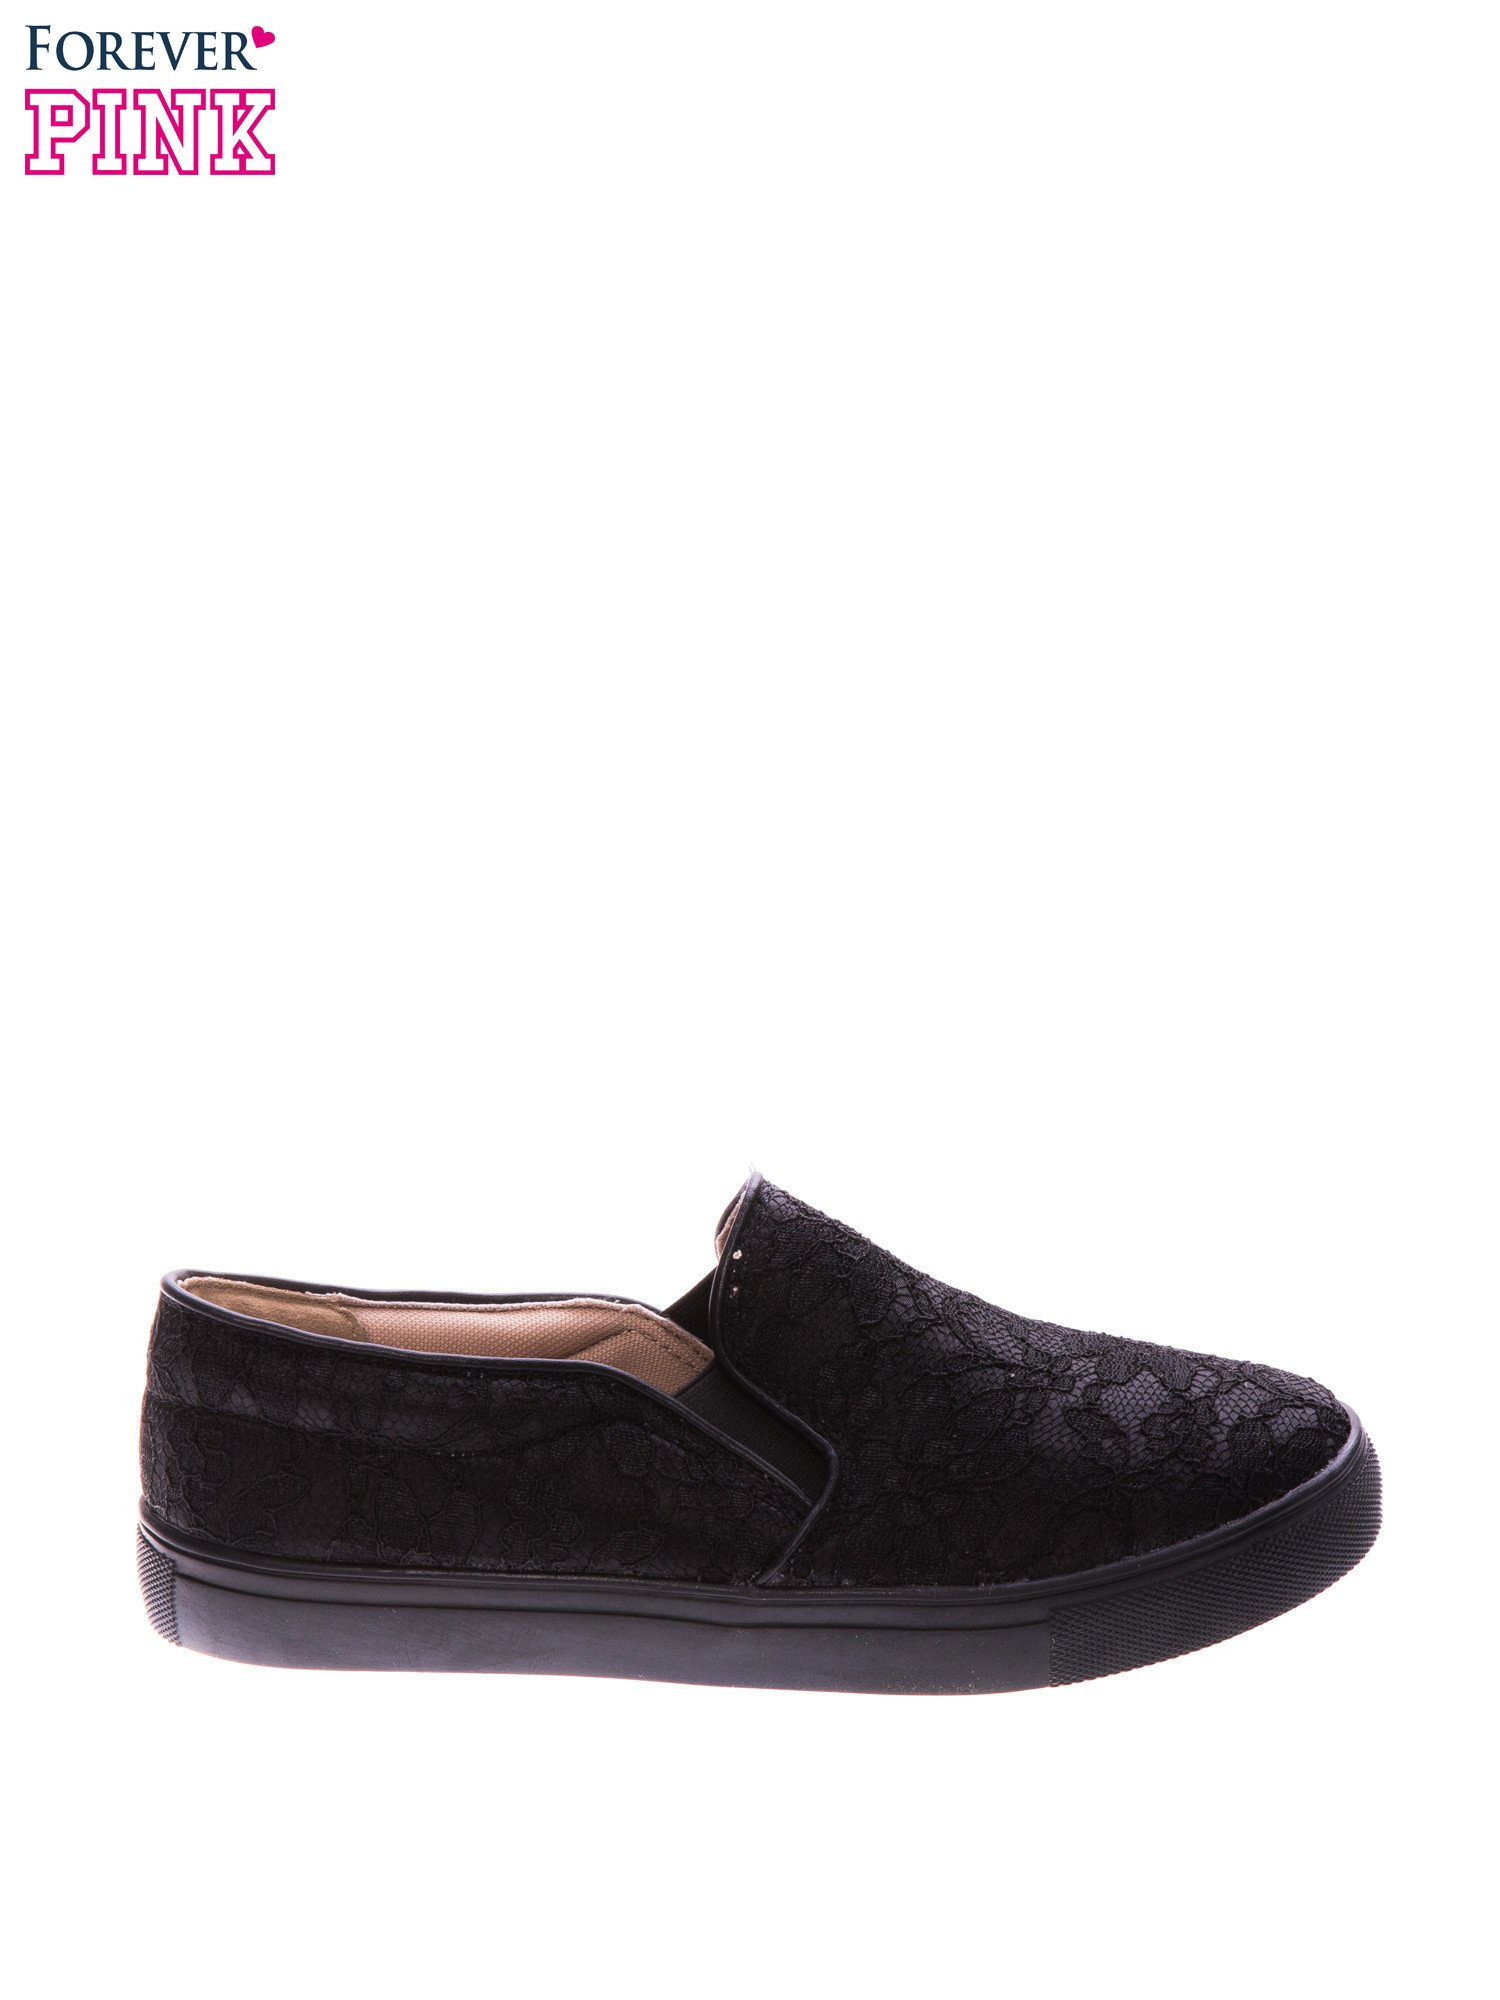 Czarne koronkowe buty slip on                                  zdj.                                  1